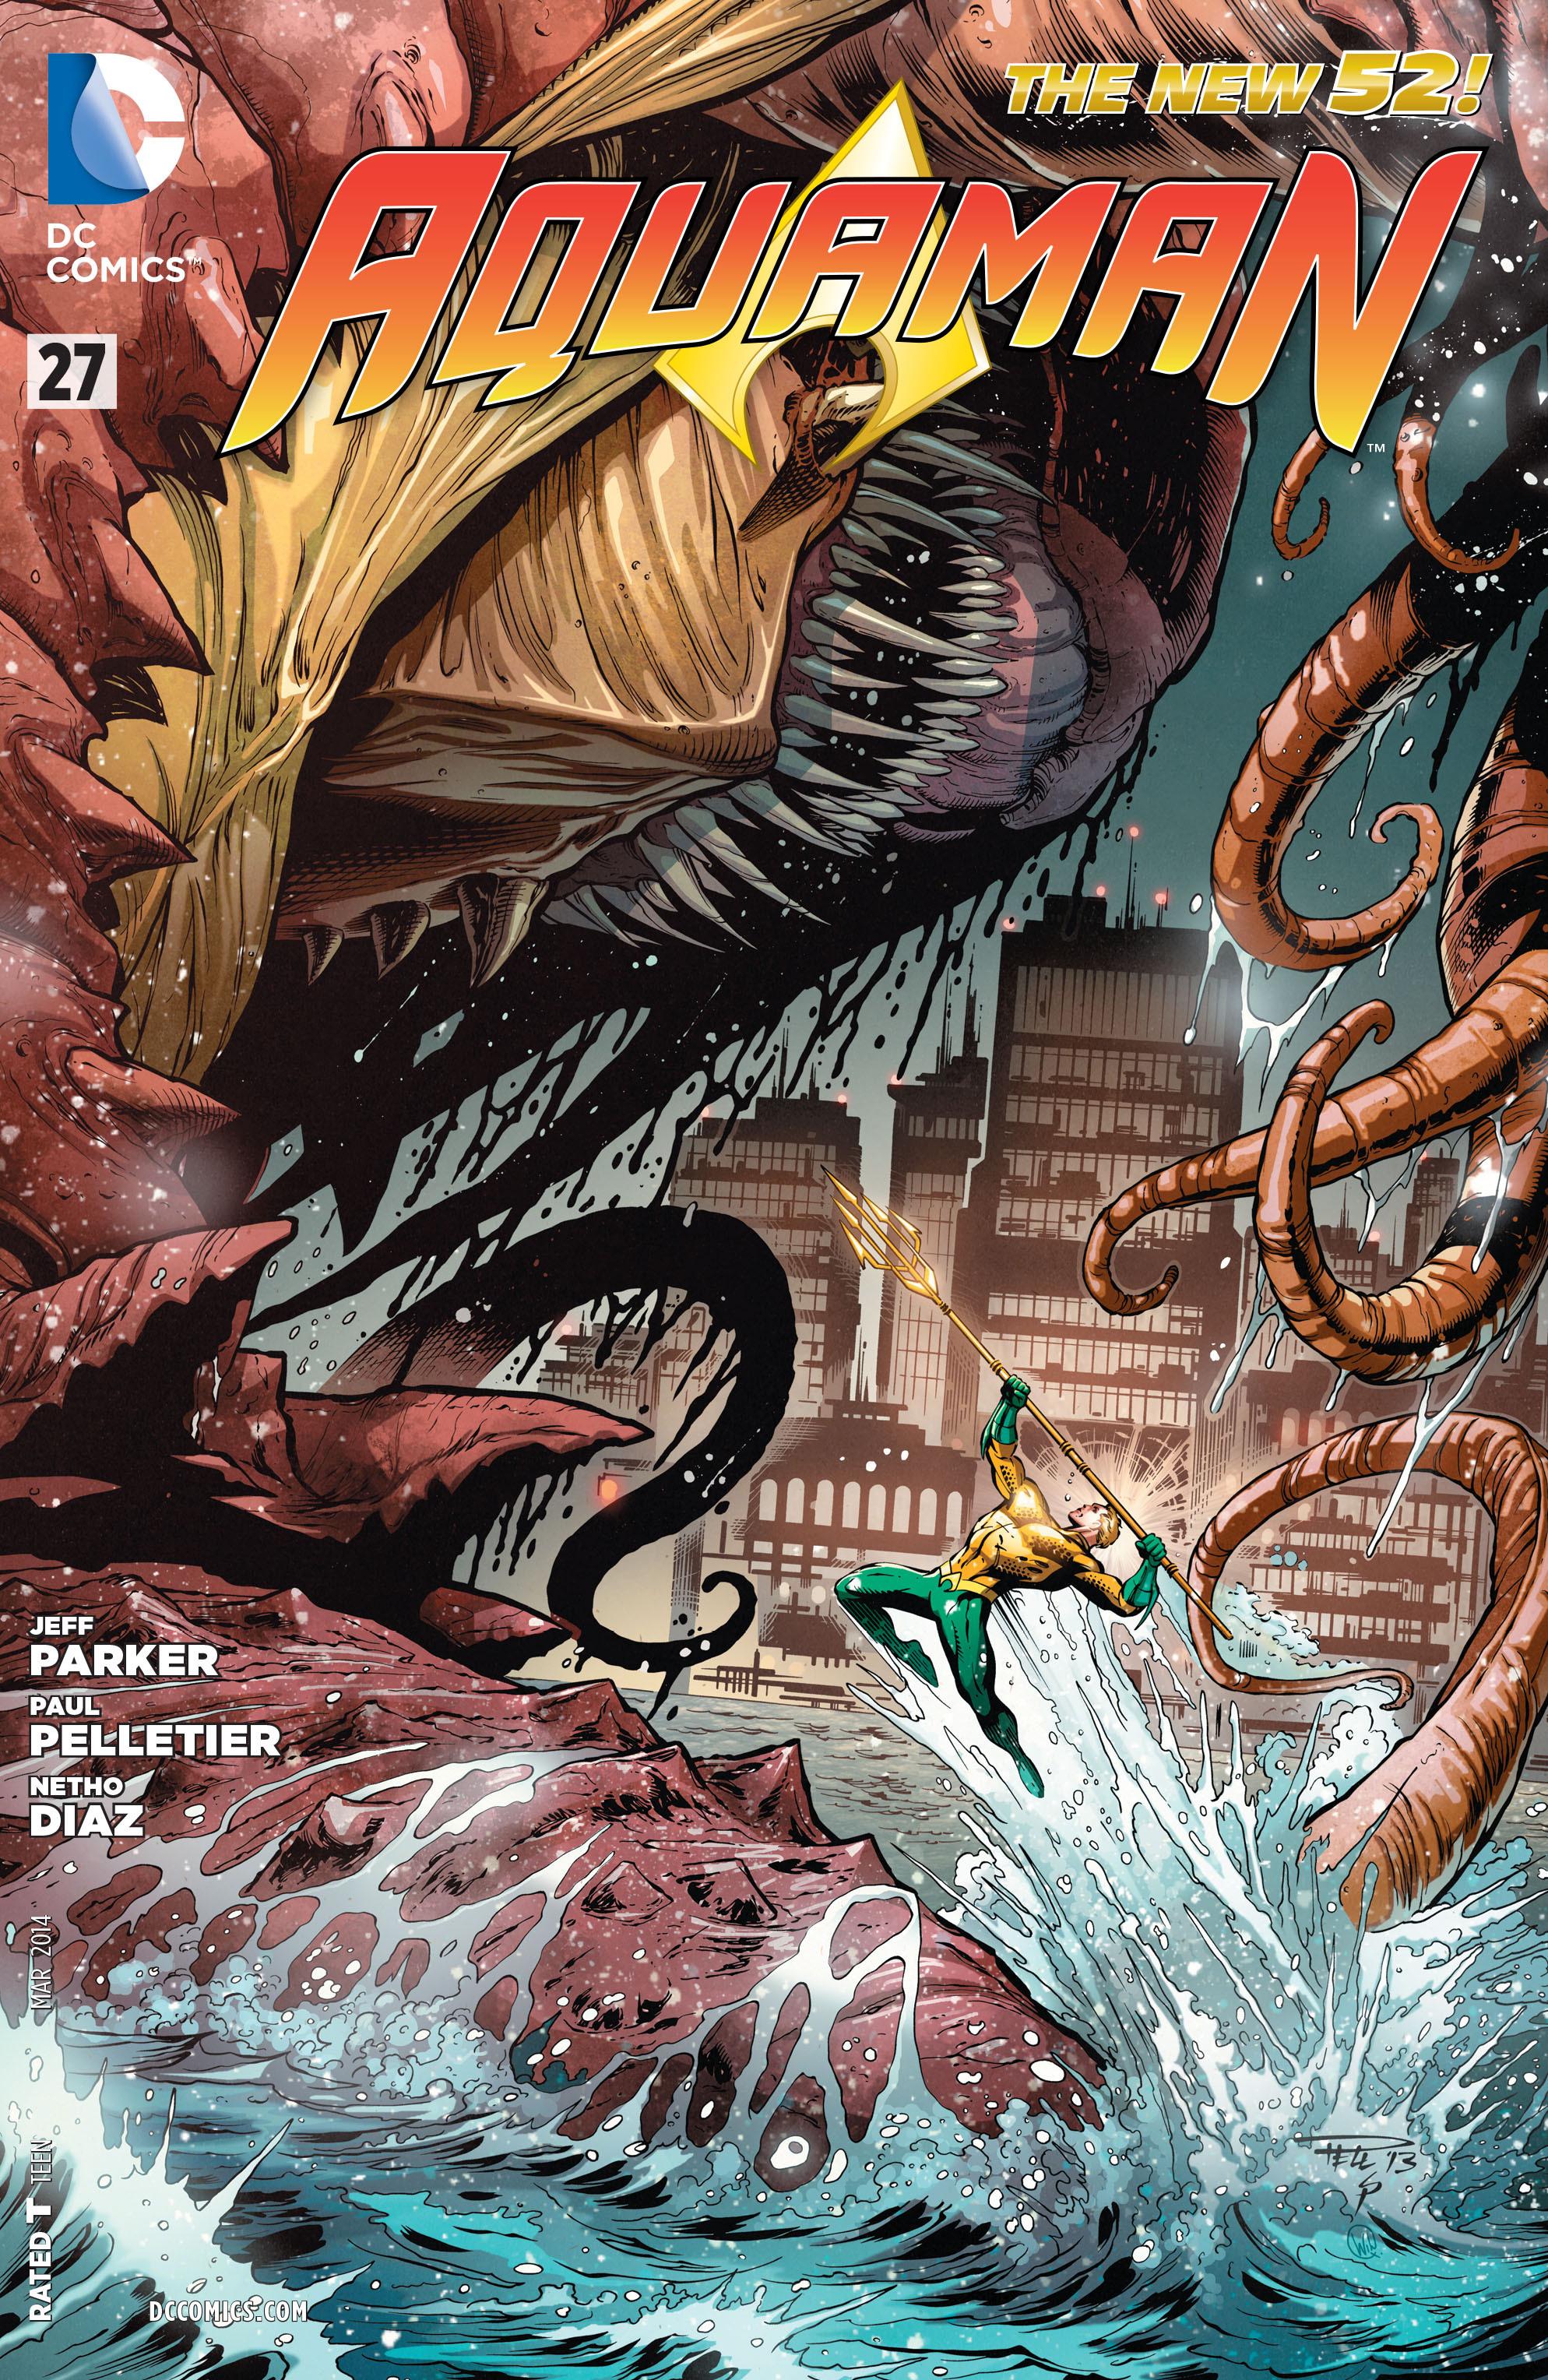 Read online Aquaman (2011) comic -  Issue #27 - 1